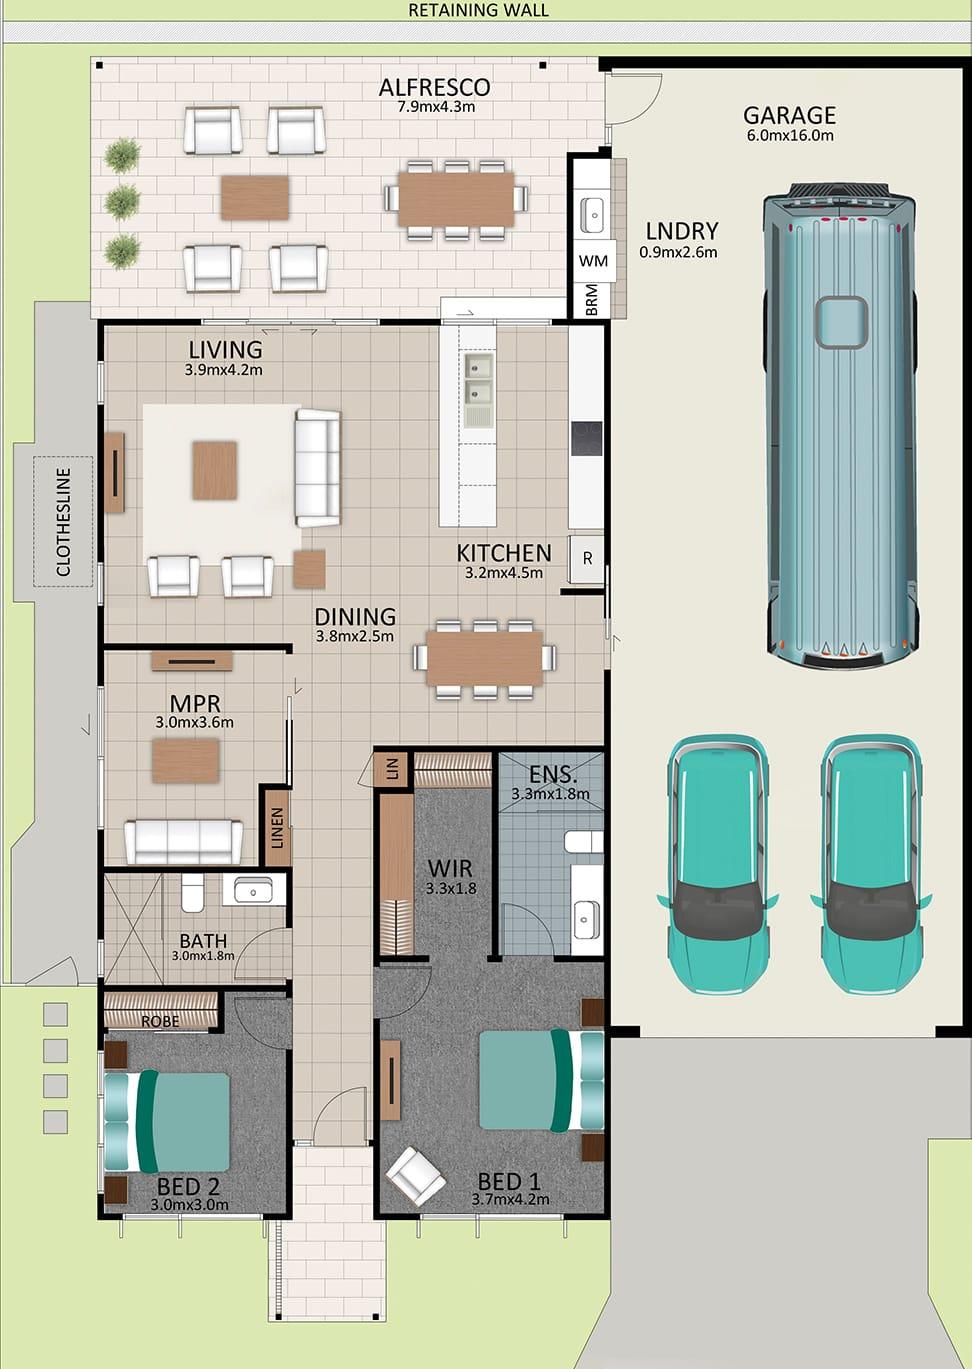 LAT25 Floorplan GAL OCT20 LOT 216 - Lot 216